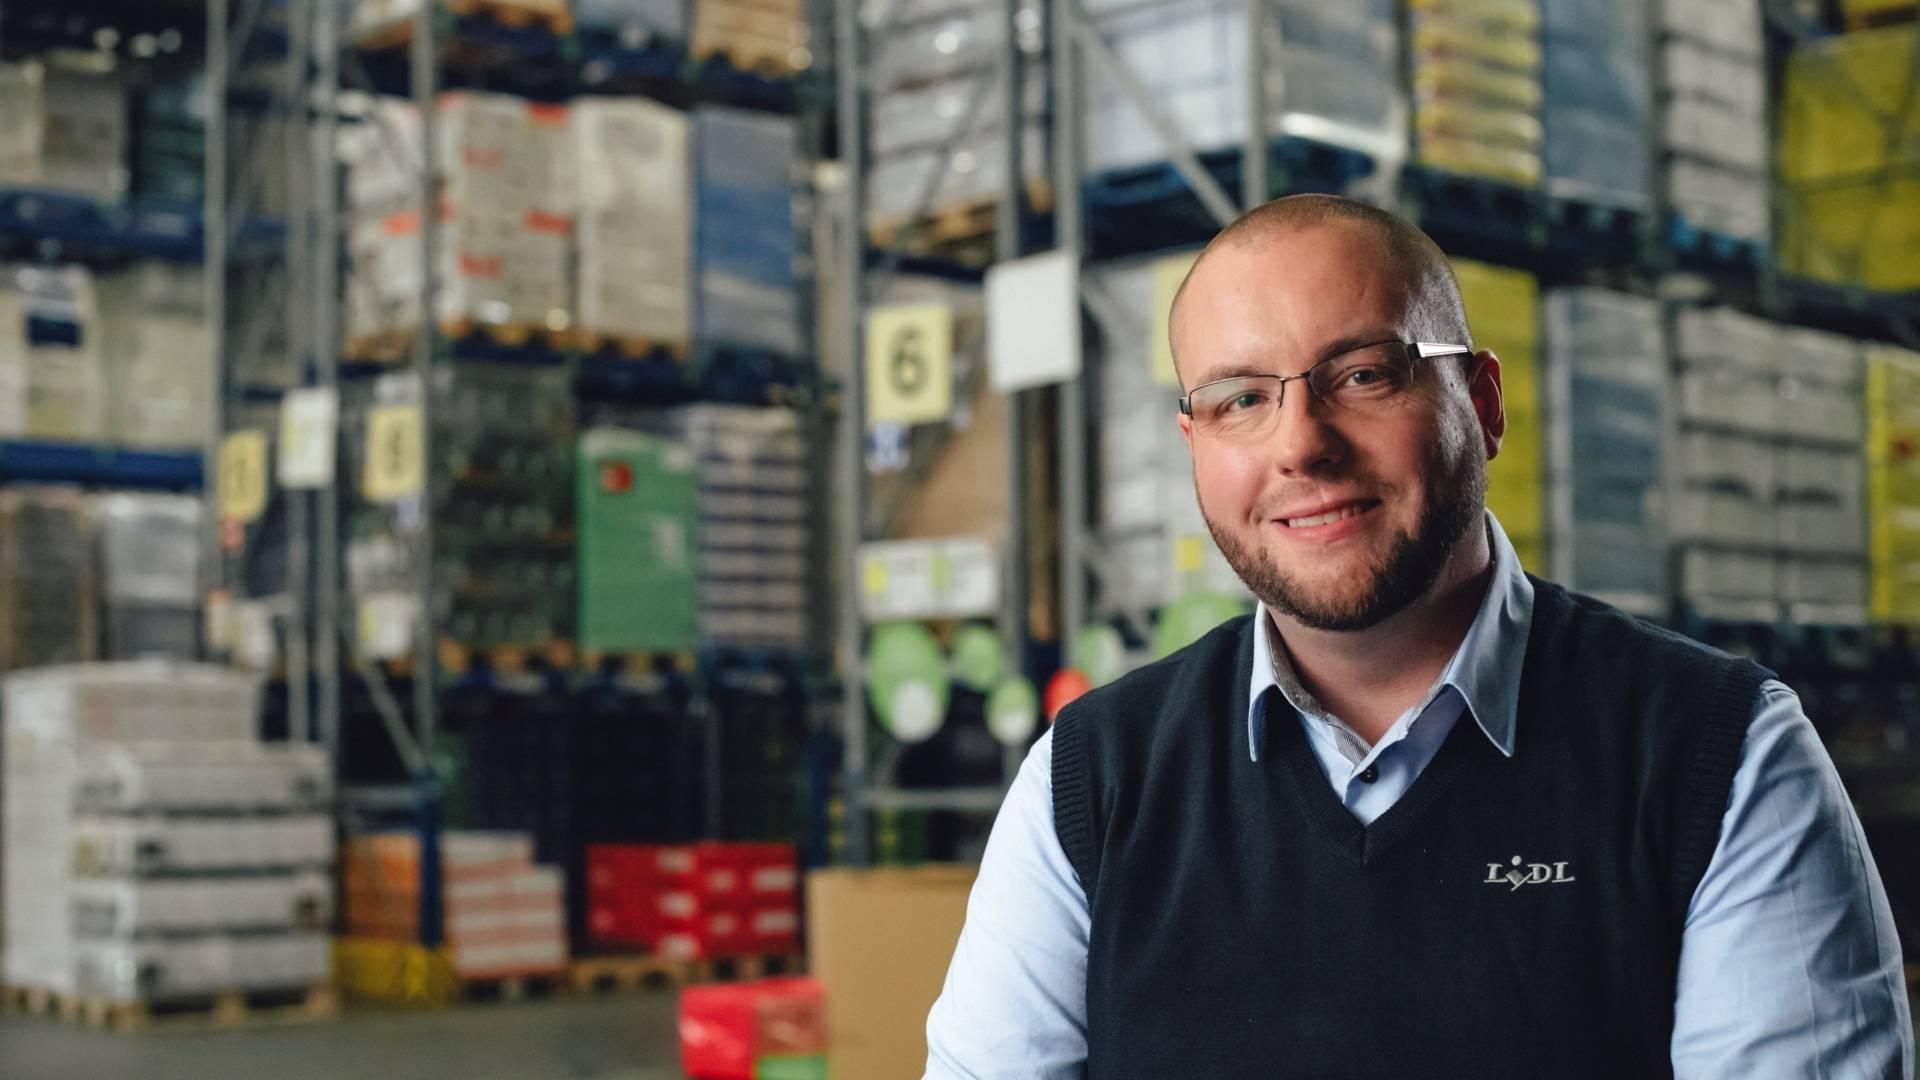 Rafael, Teamleiter Logistik im Zentrallager bei Lidl